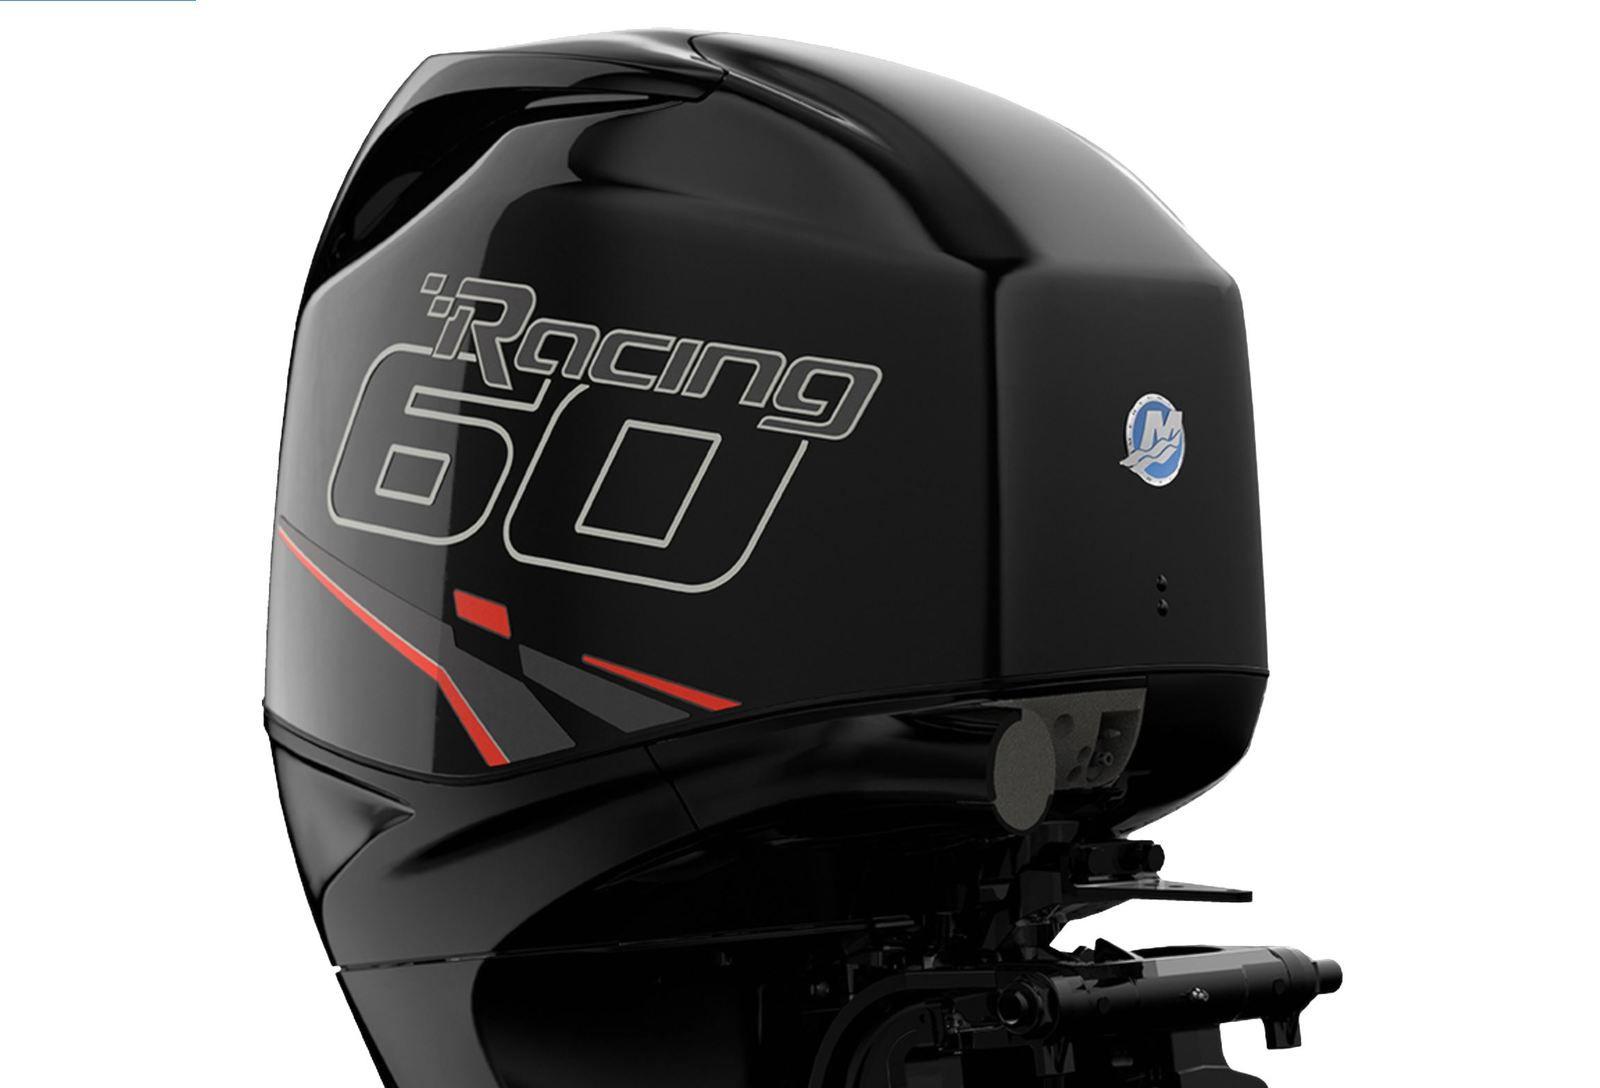 Mercury Marine launches new Mercury Racing 60R outboard engine